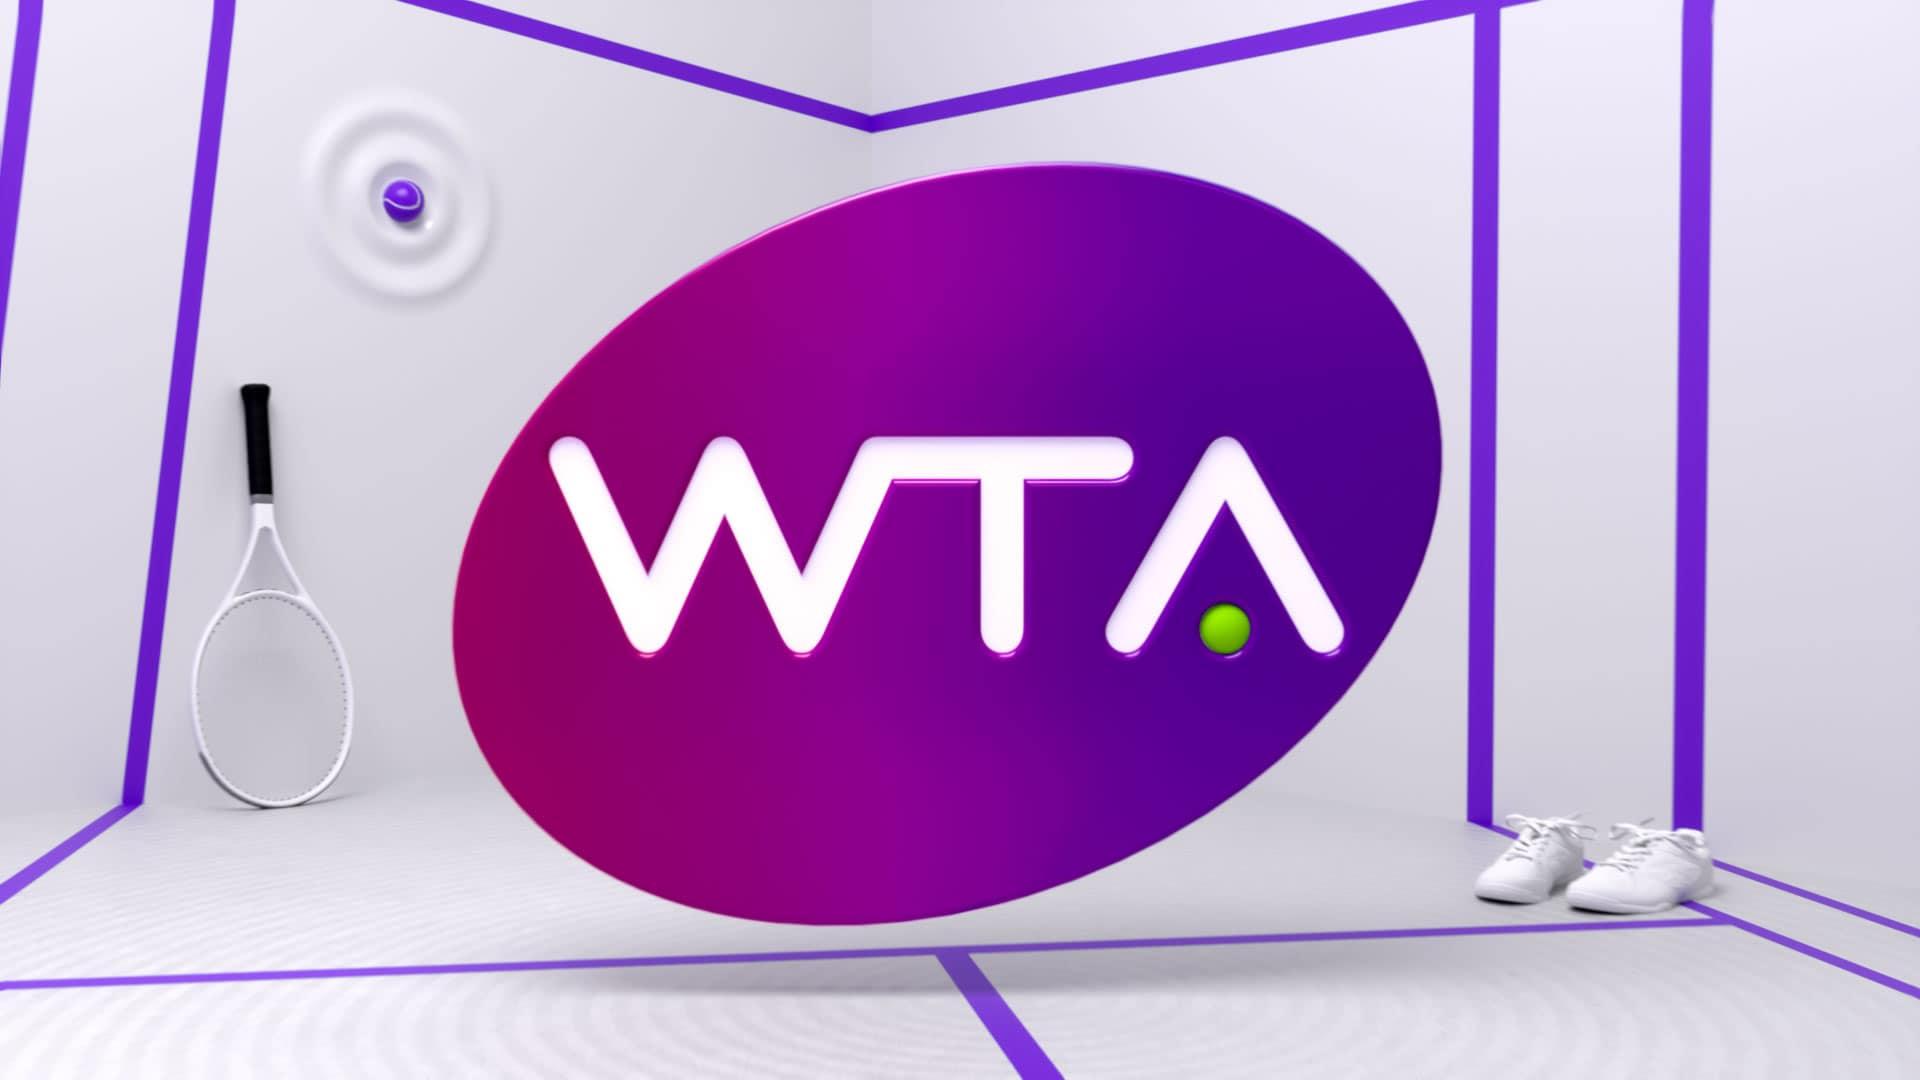 2020 WTA Rebranding Girraphic